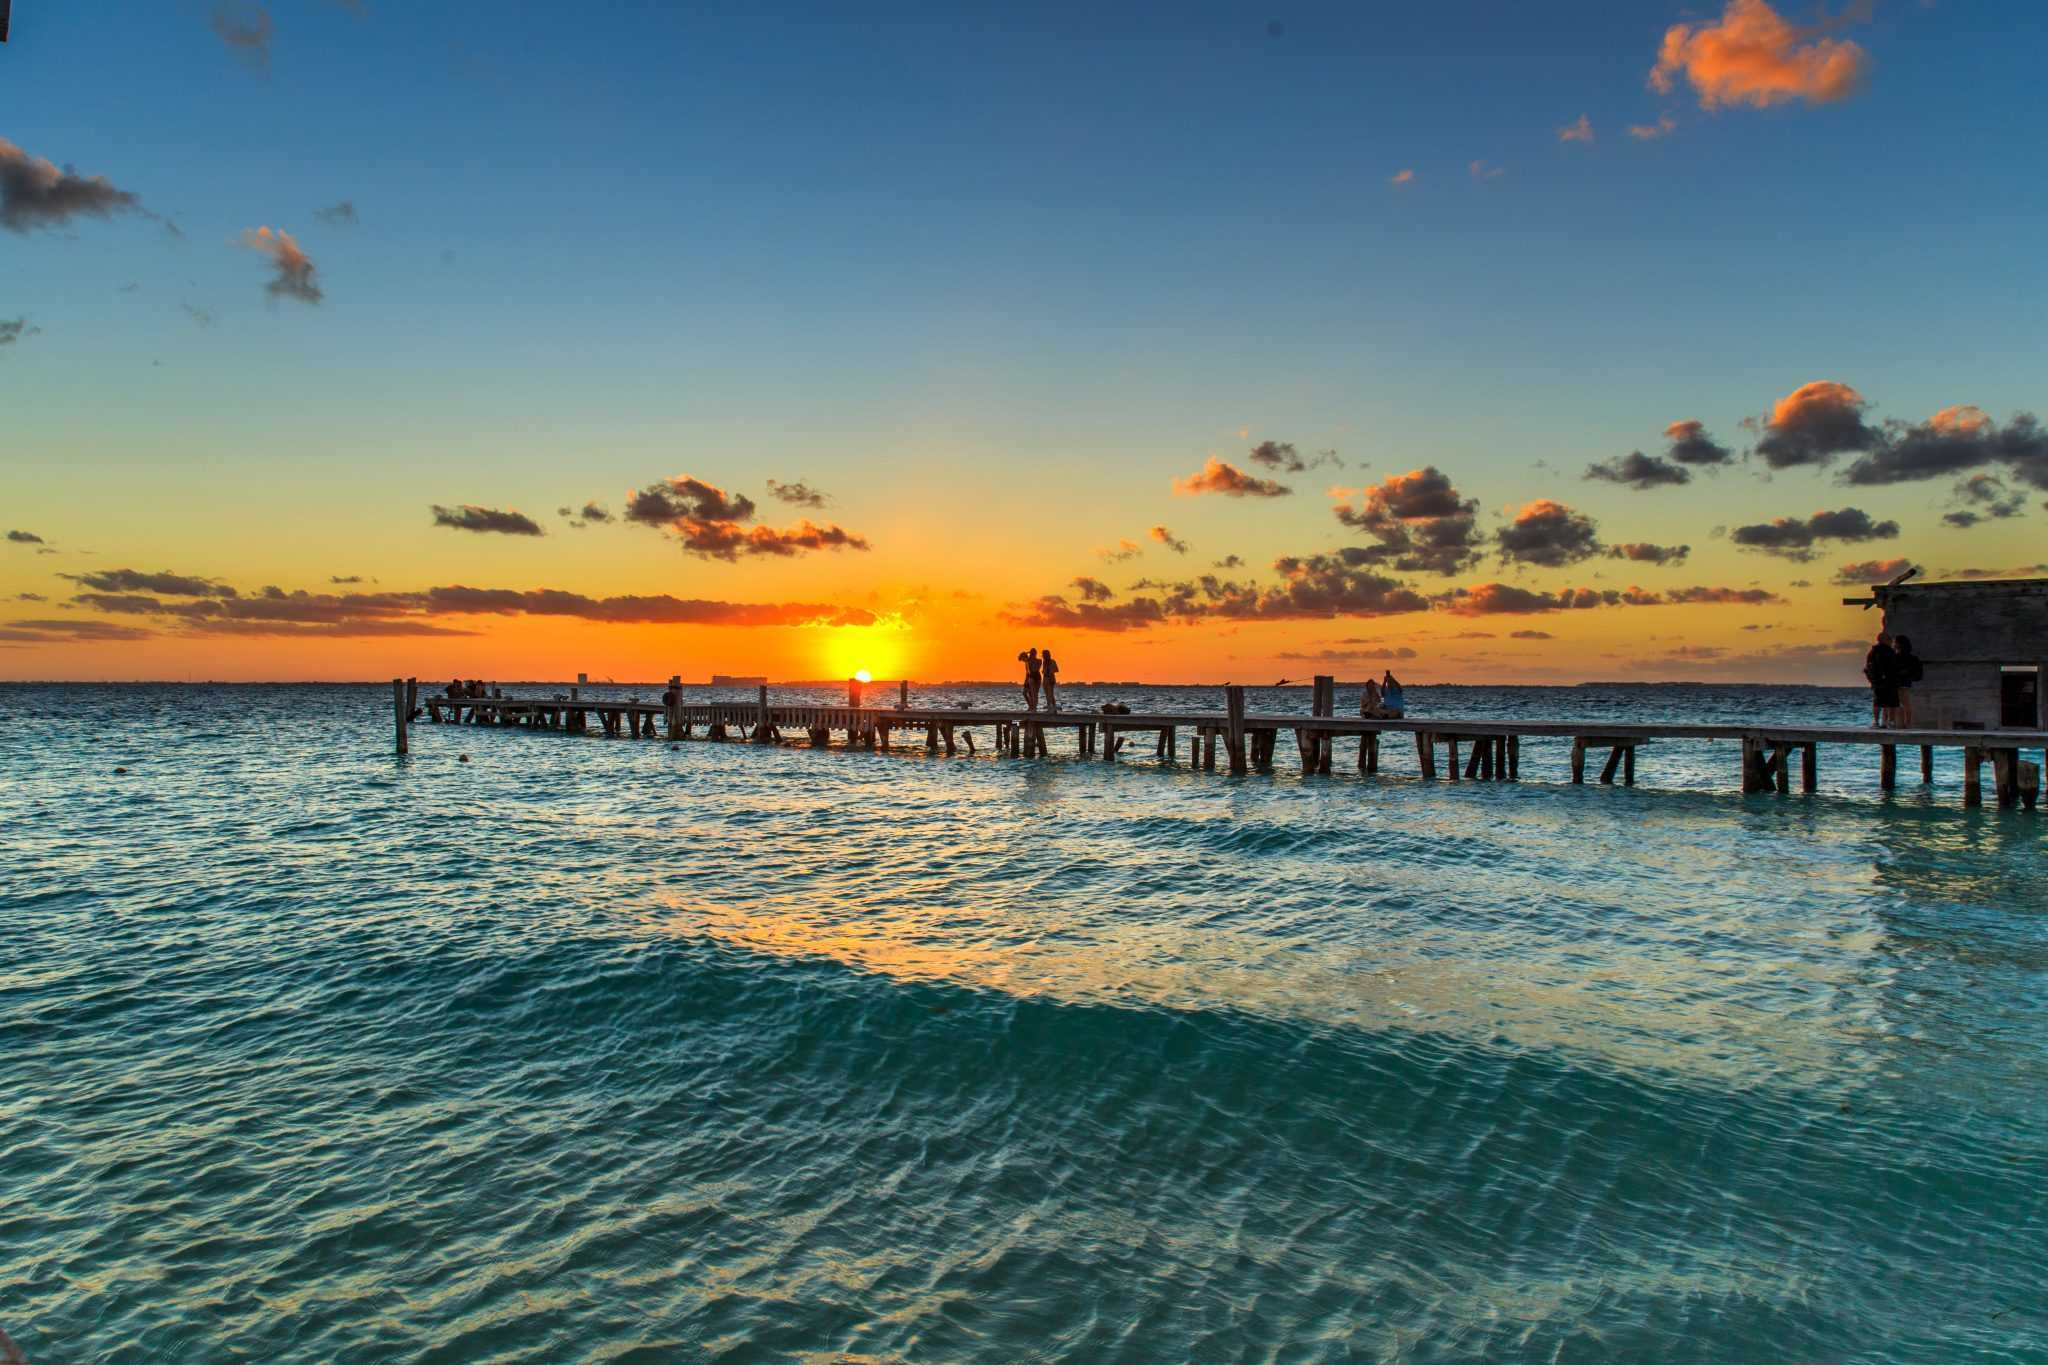 Isla Mujeres Pier at Sunset